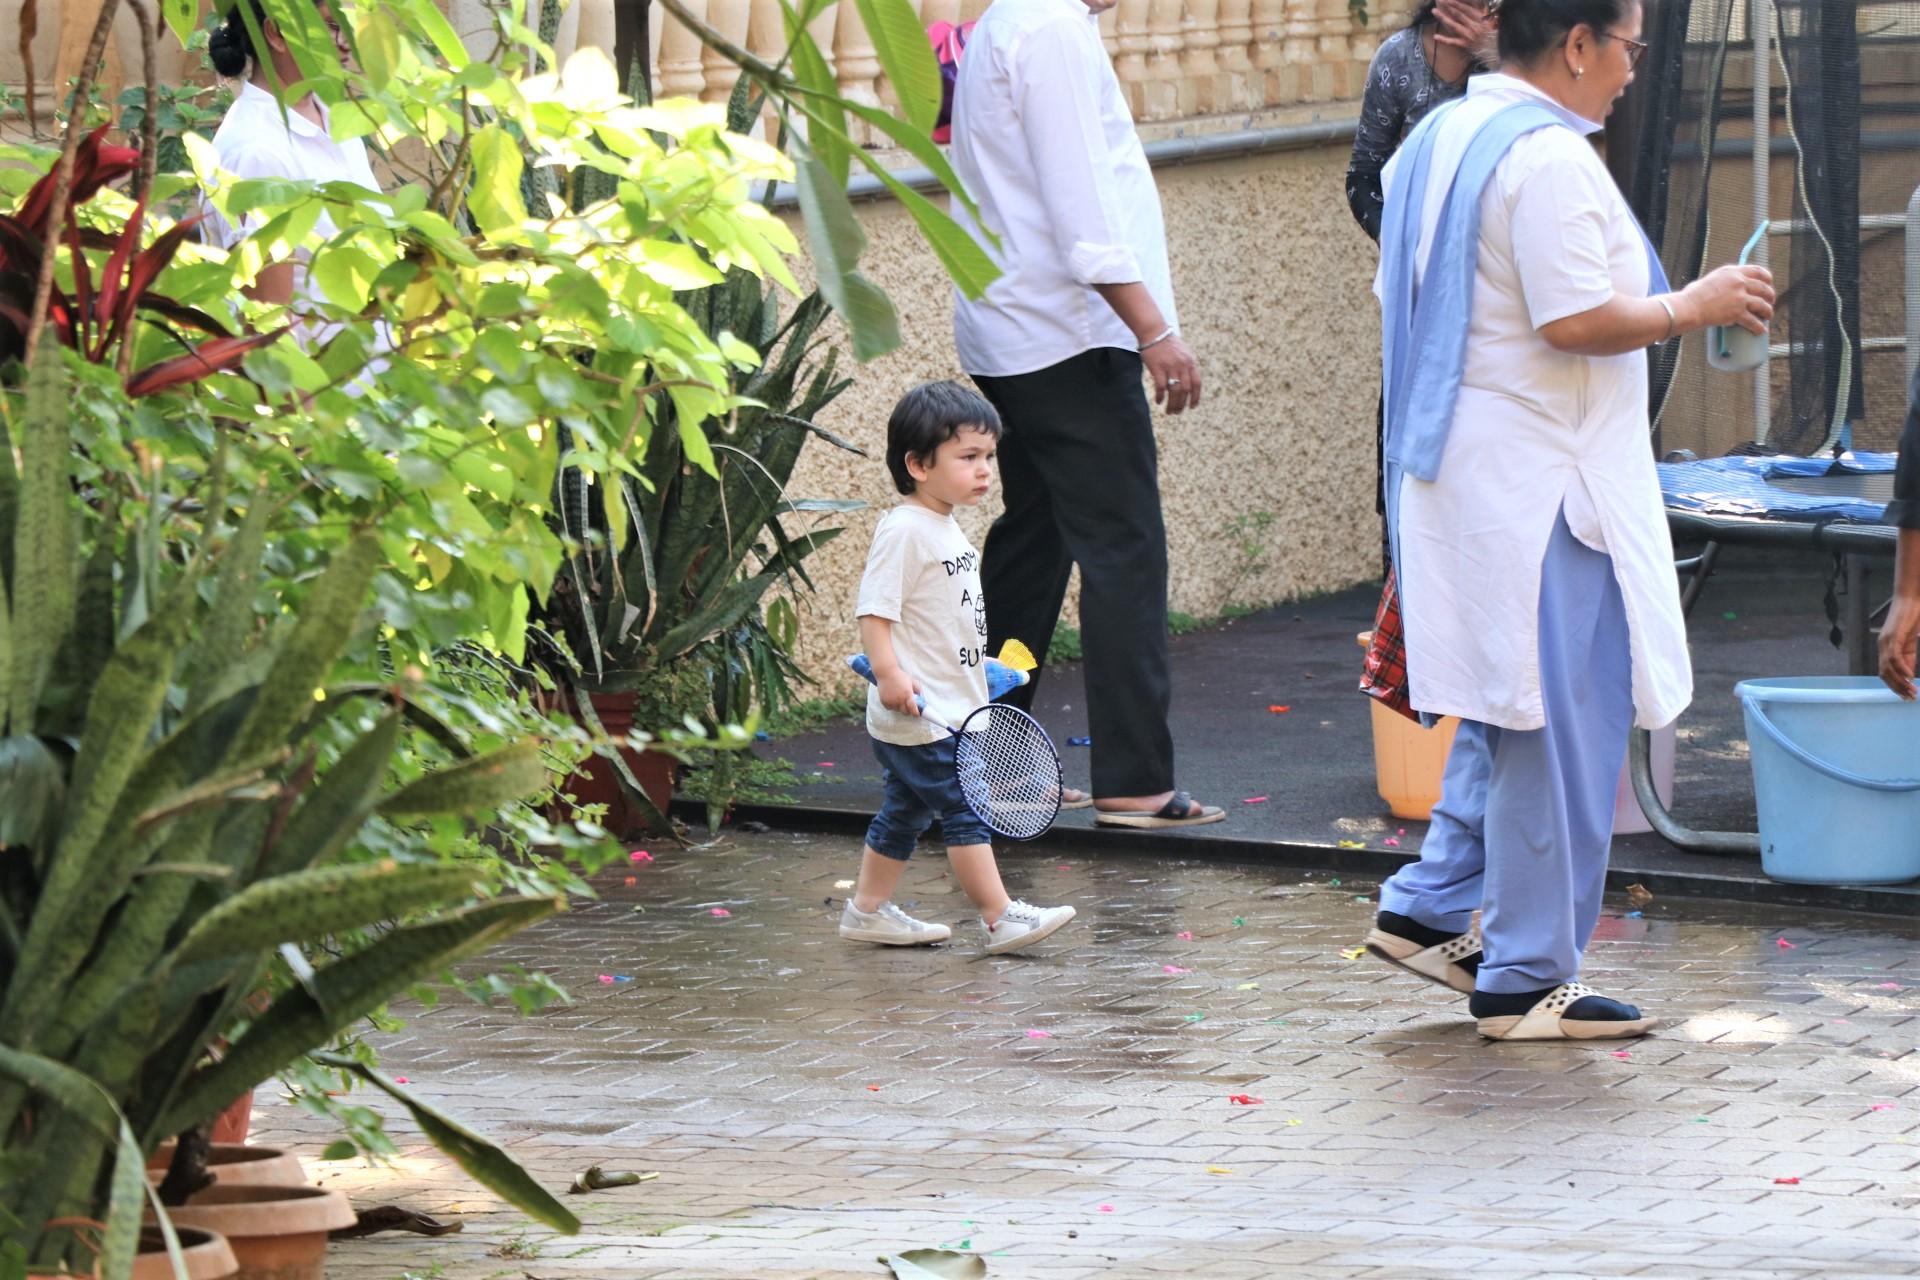 WATCH: Adorable Cousins Taimur Ali Khan and Inaaya Naumi Kemmu Have a Playdate Together!